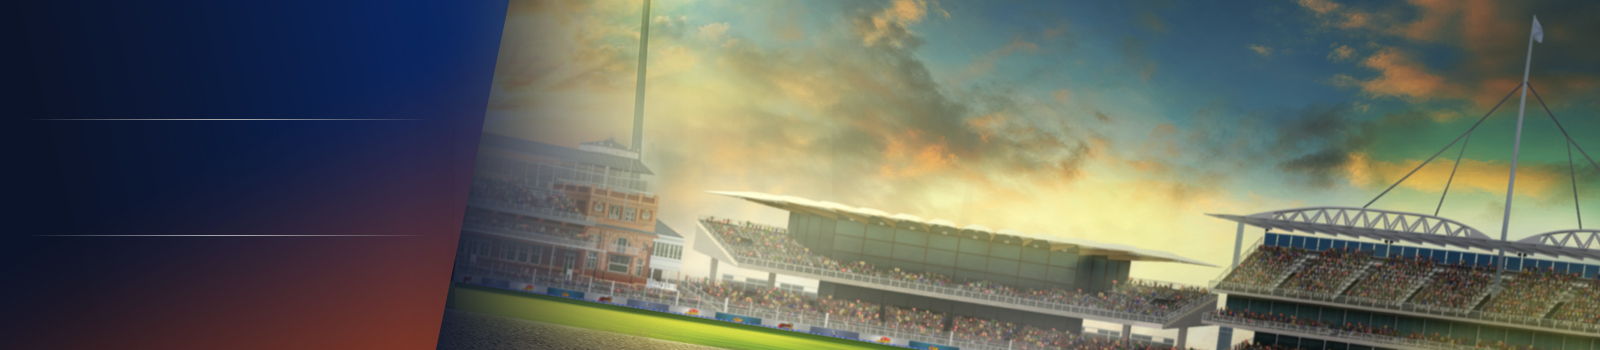 world-cricket-championship-2